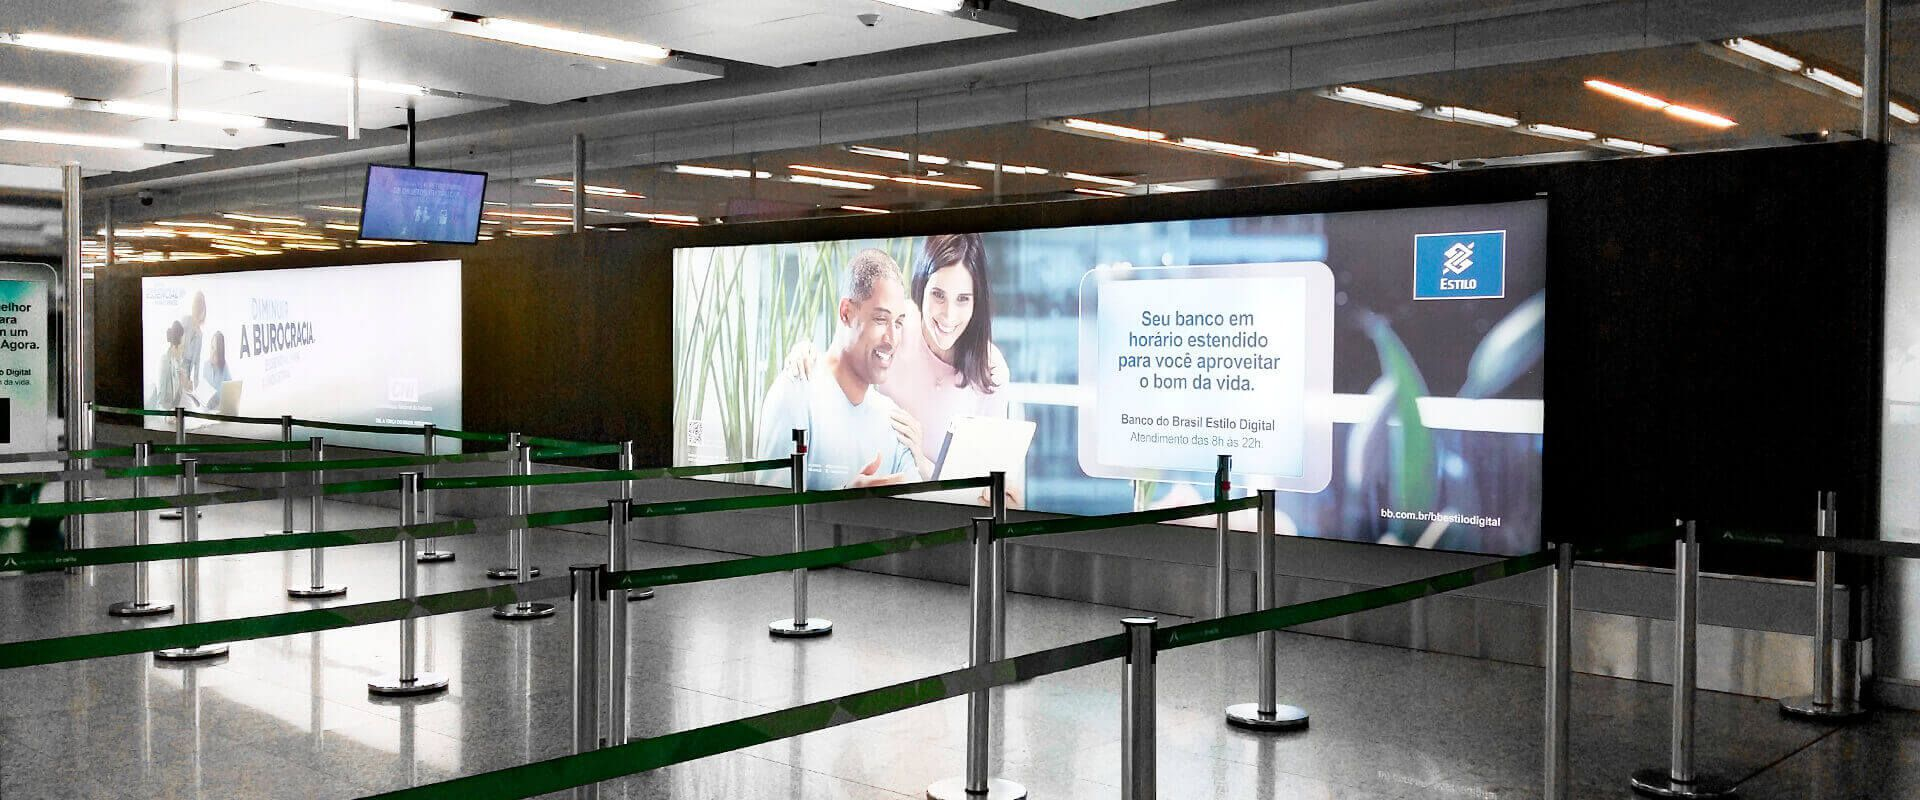 Brasilia-Airport-Brazil2.jpg